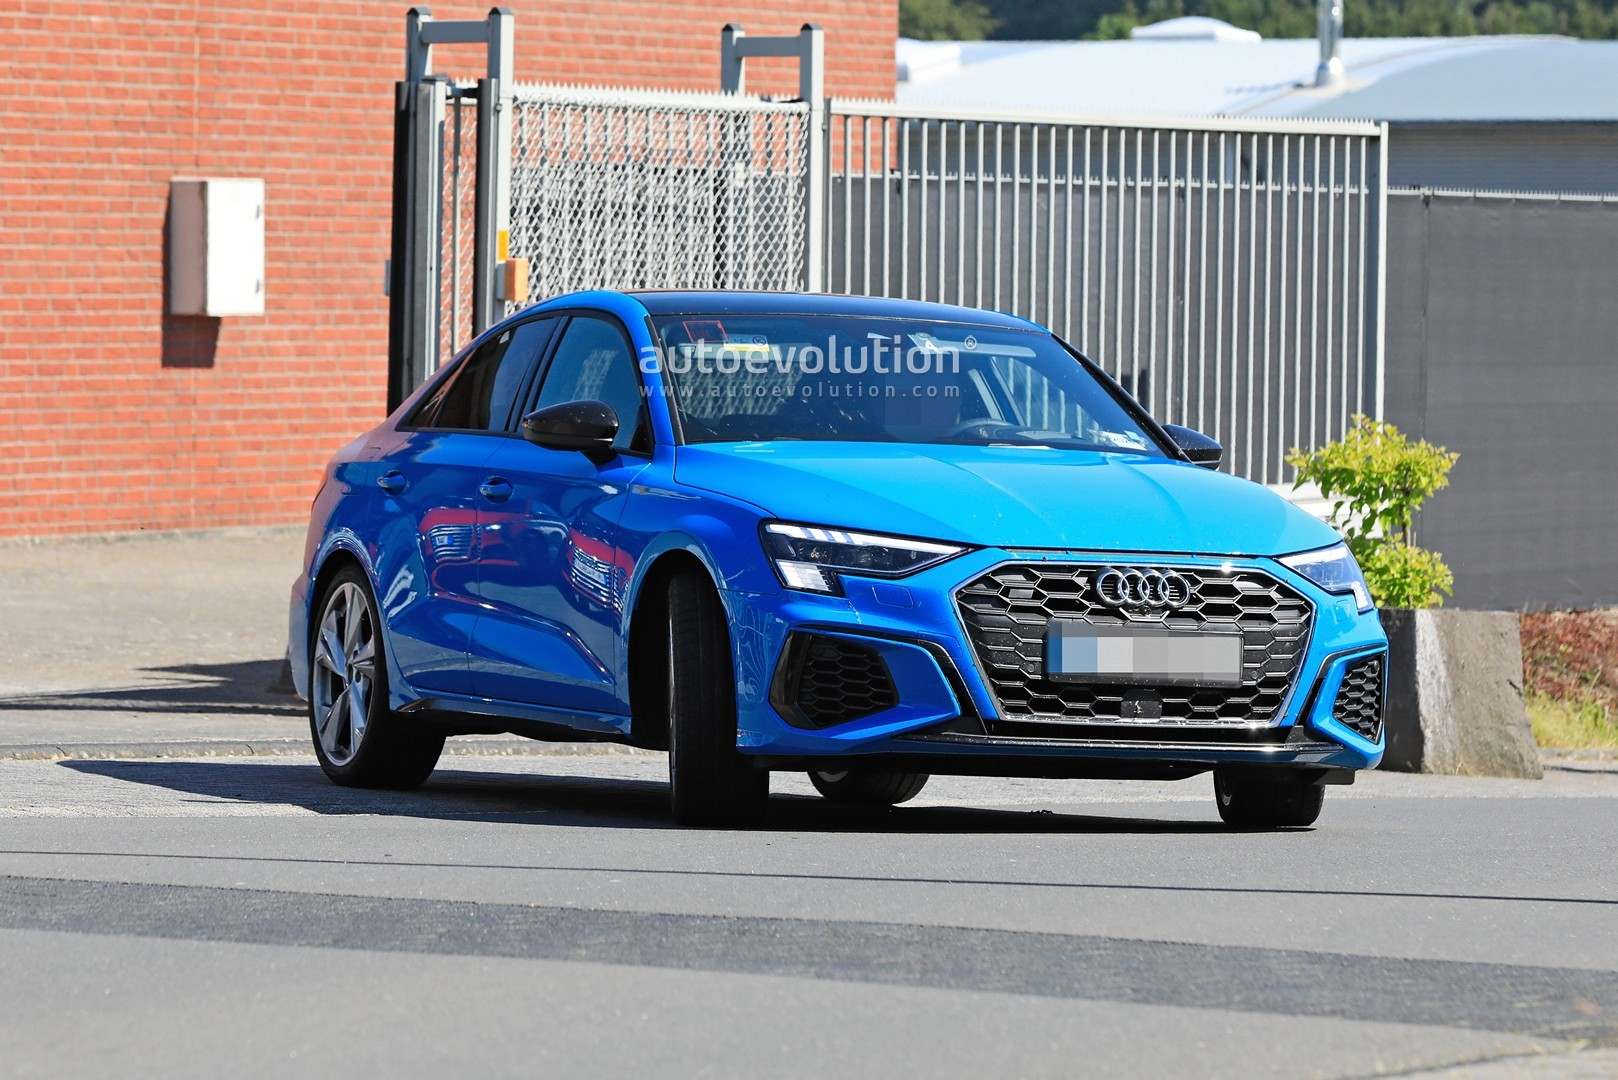 2021 Audi S3 Rocks Blue Paint And Quad Exhaust Ahead Of Debut Autoevolution